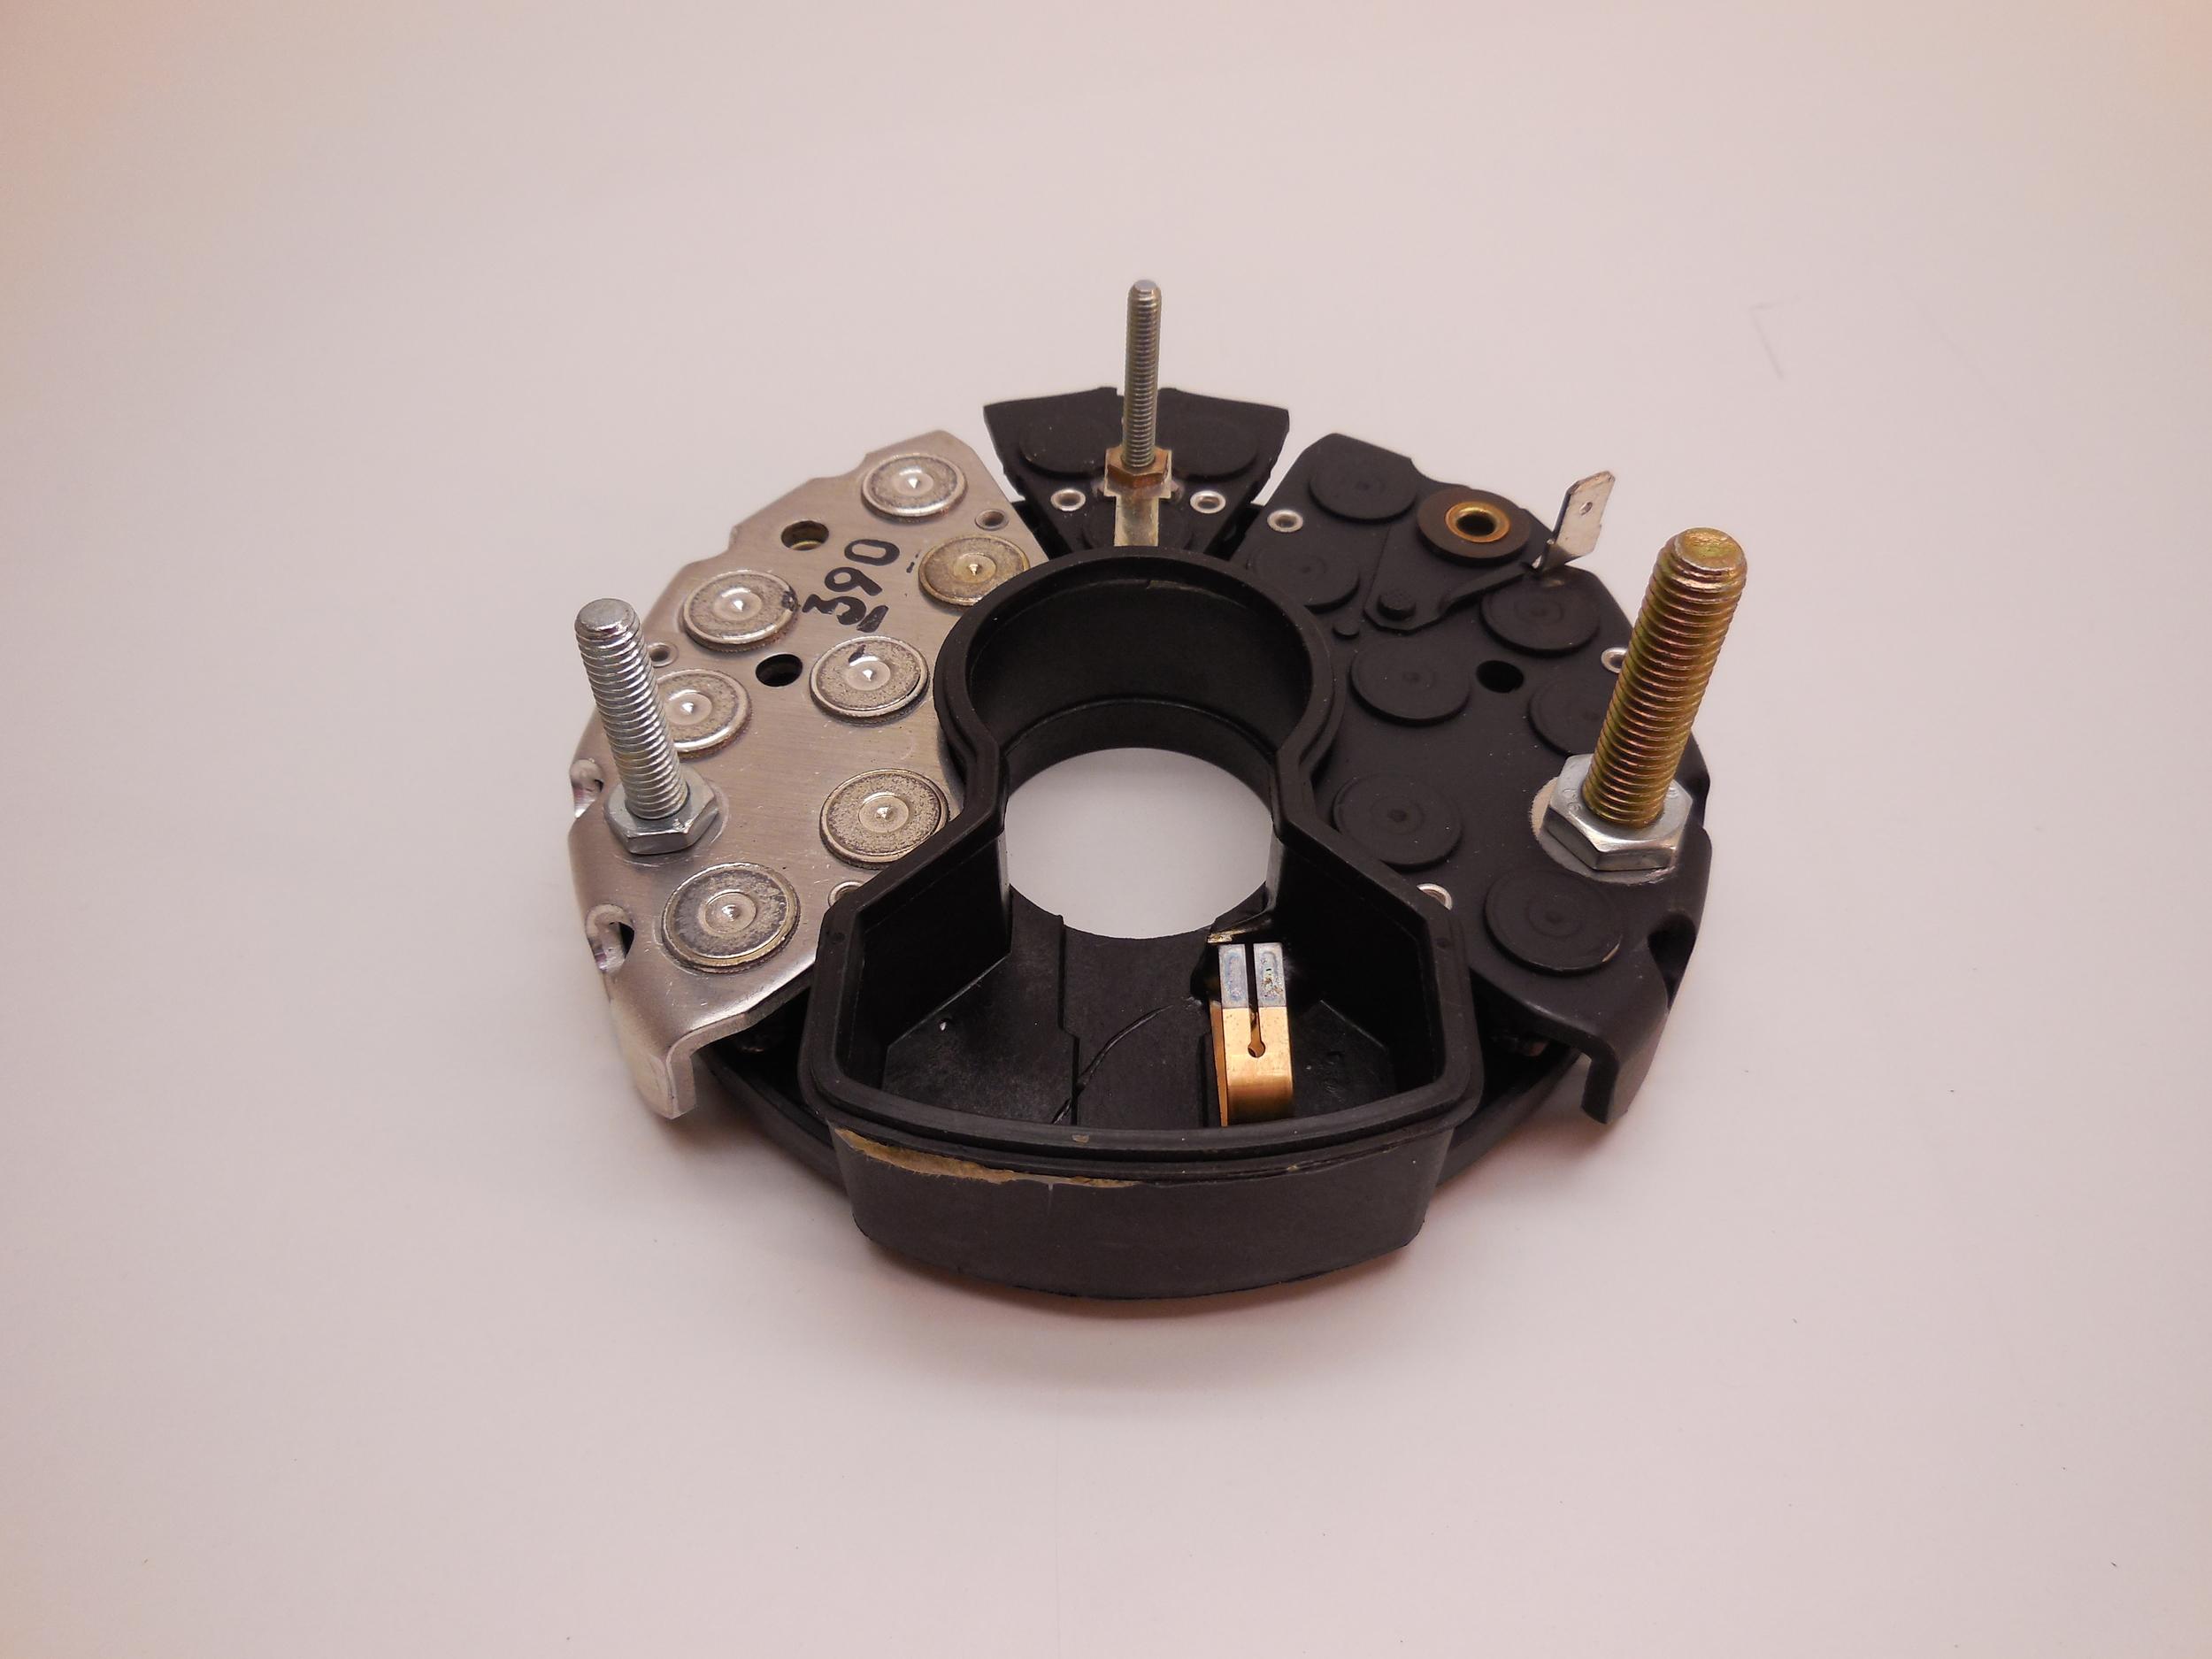 diode plate Bosch Nr: 1 127 320 390 price: